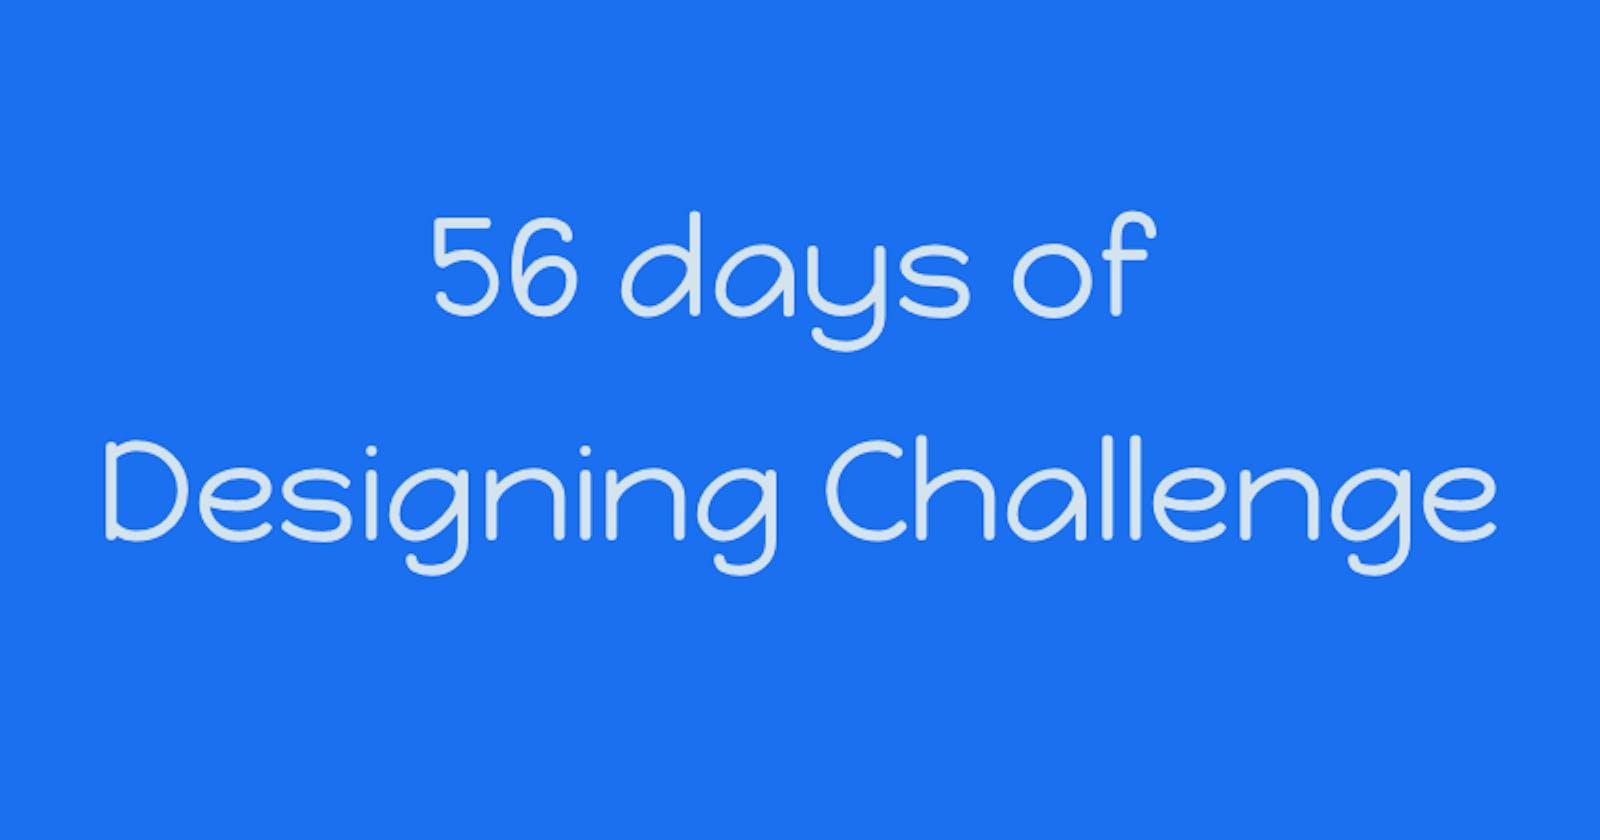 I am doing a 56 days of Design Challenge